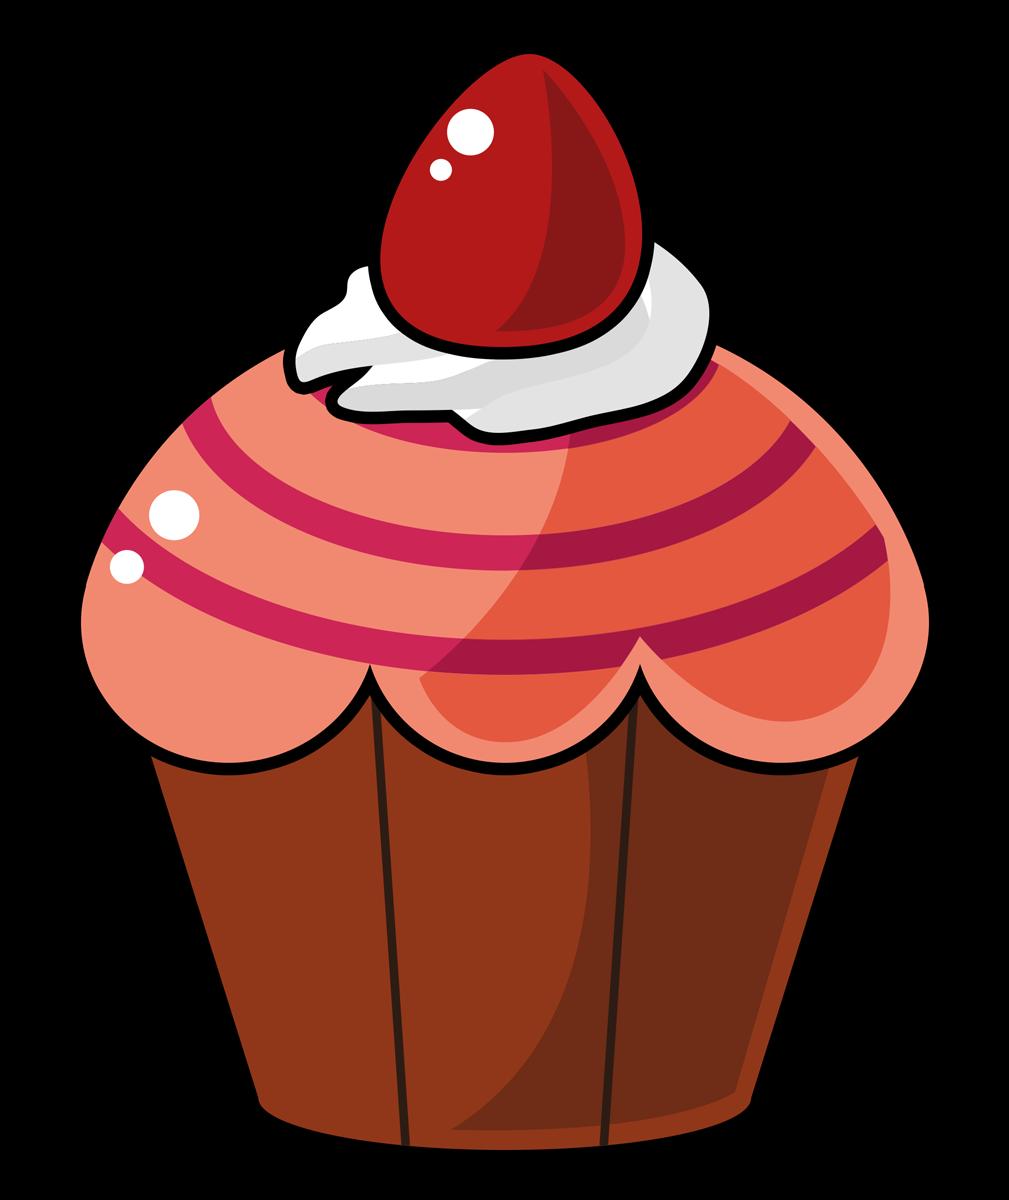 Free Cartoon Cupcake Clip Art u0026middot; cupcake13